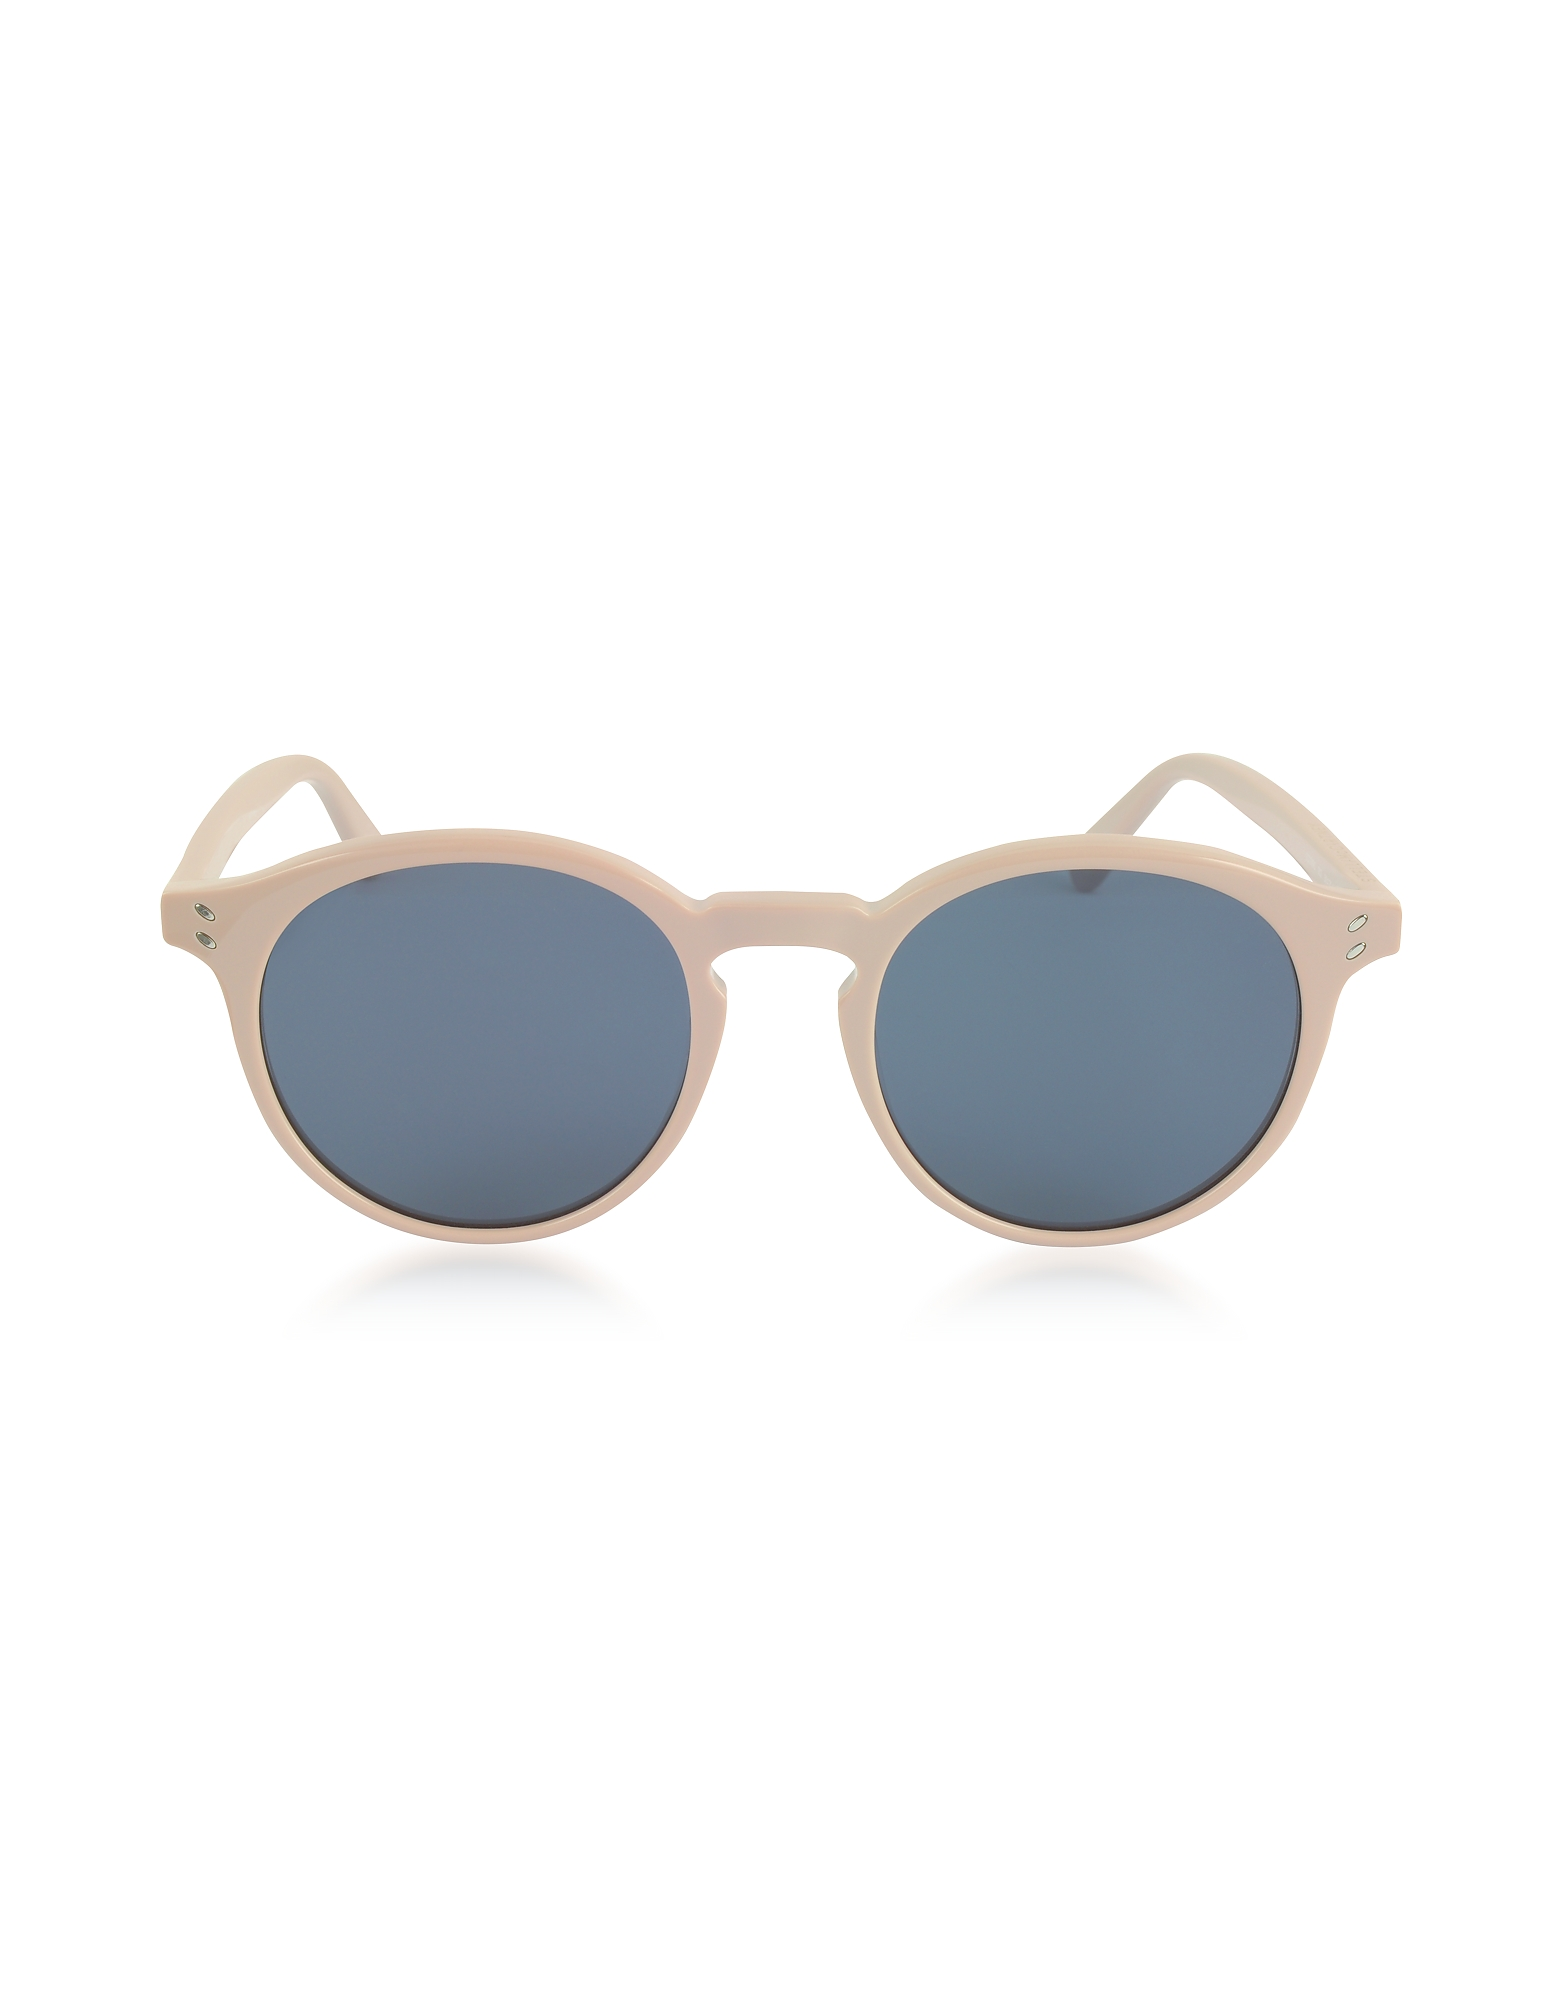 Stella McCartney Sunglasses, SC0069S Round Acetate Men's Sunglasses